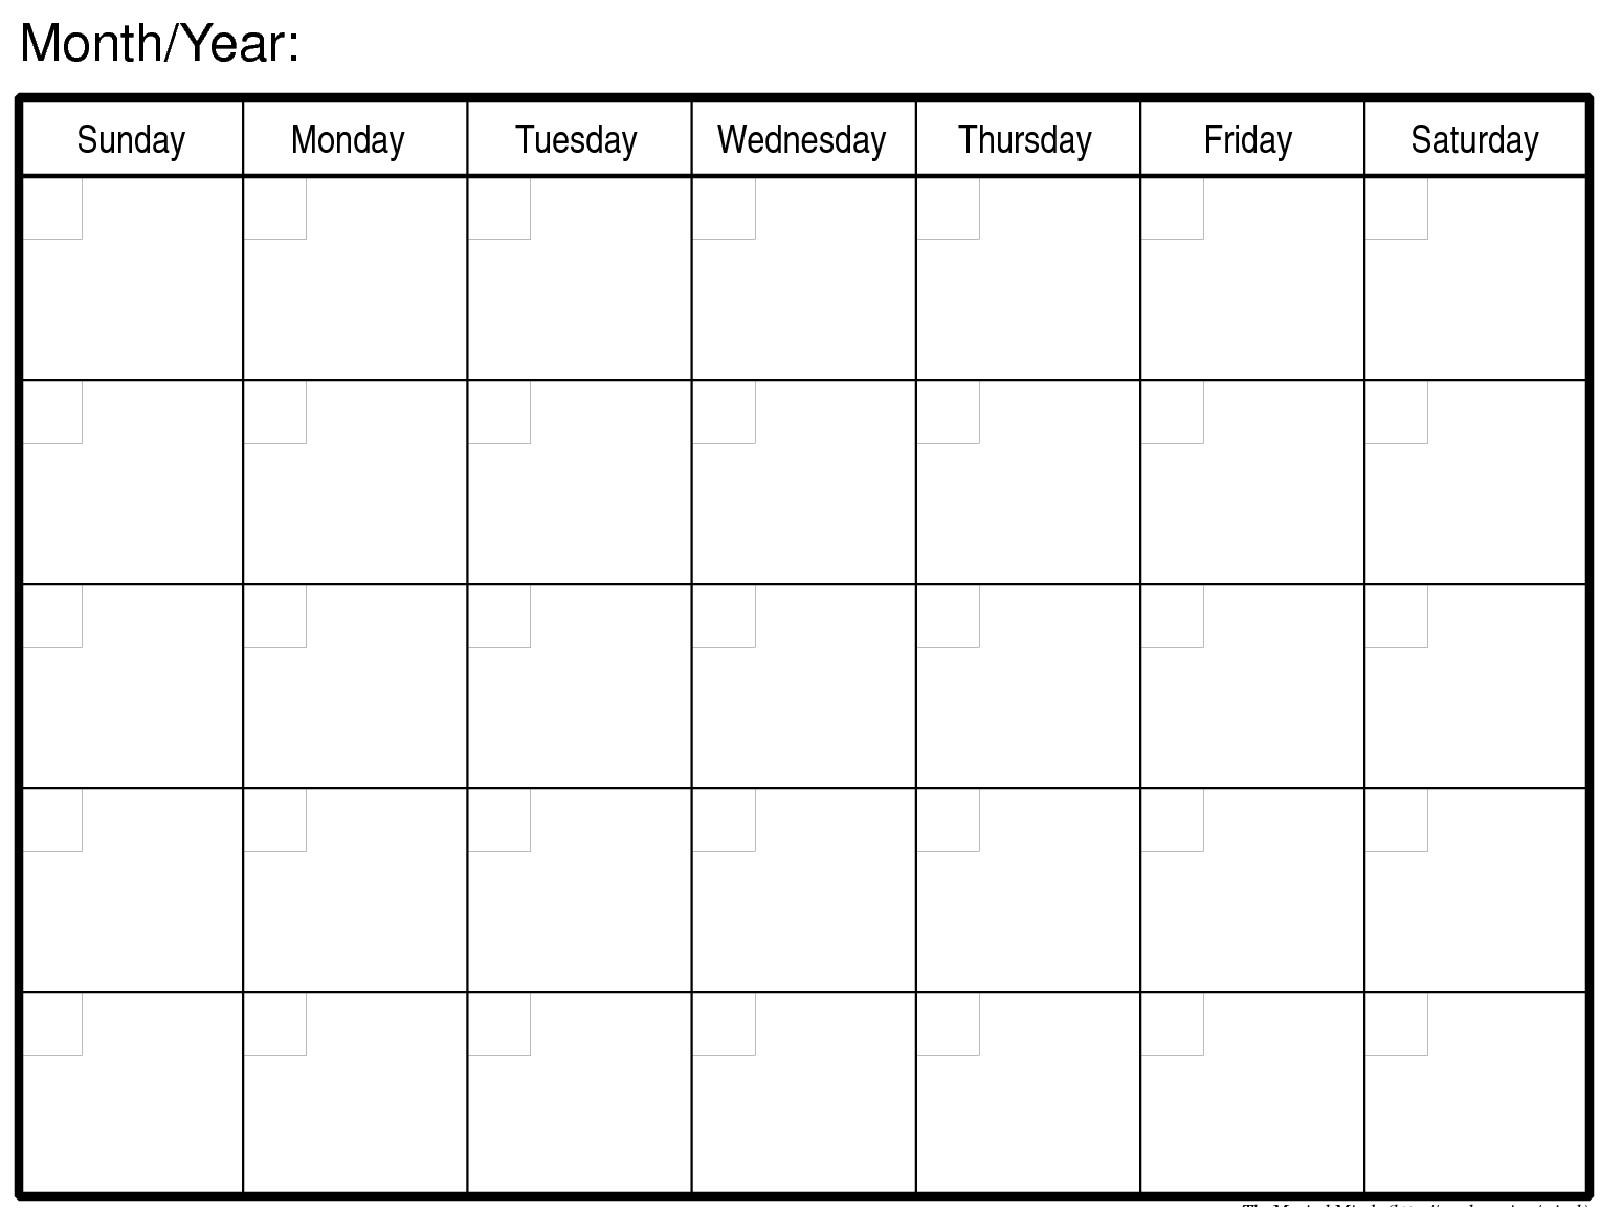 Free Printable Blank Monthly Calendar Template Blank Calendar Month Blank Calendar By Month